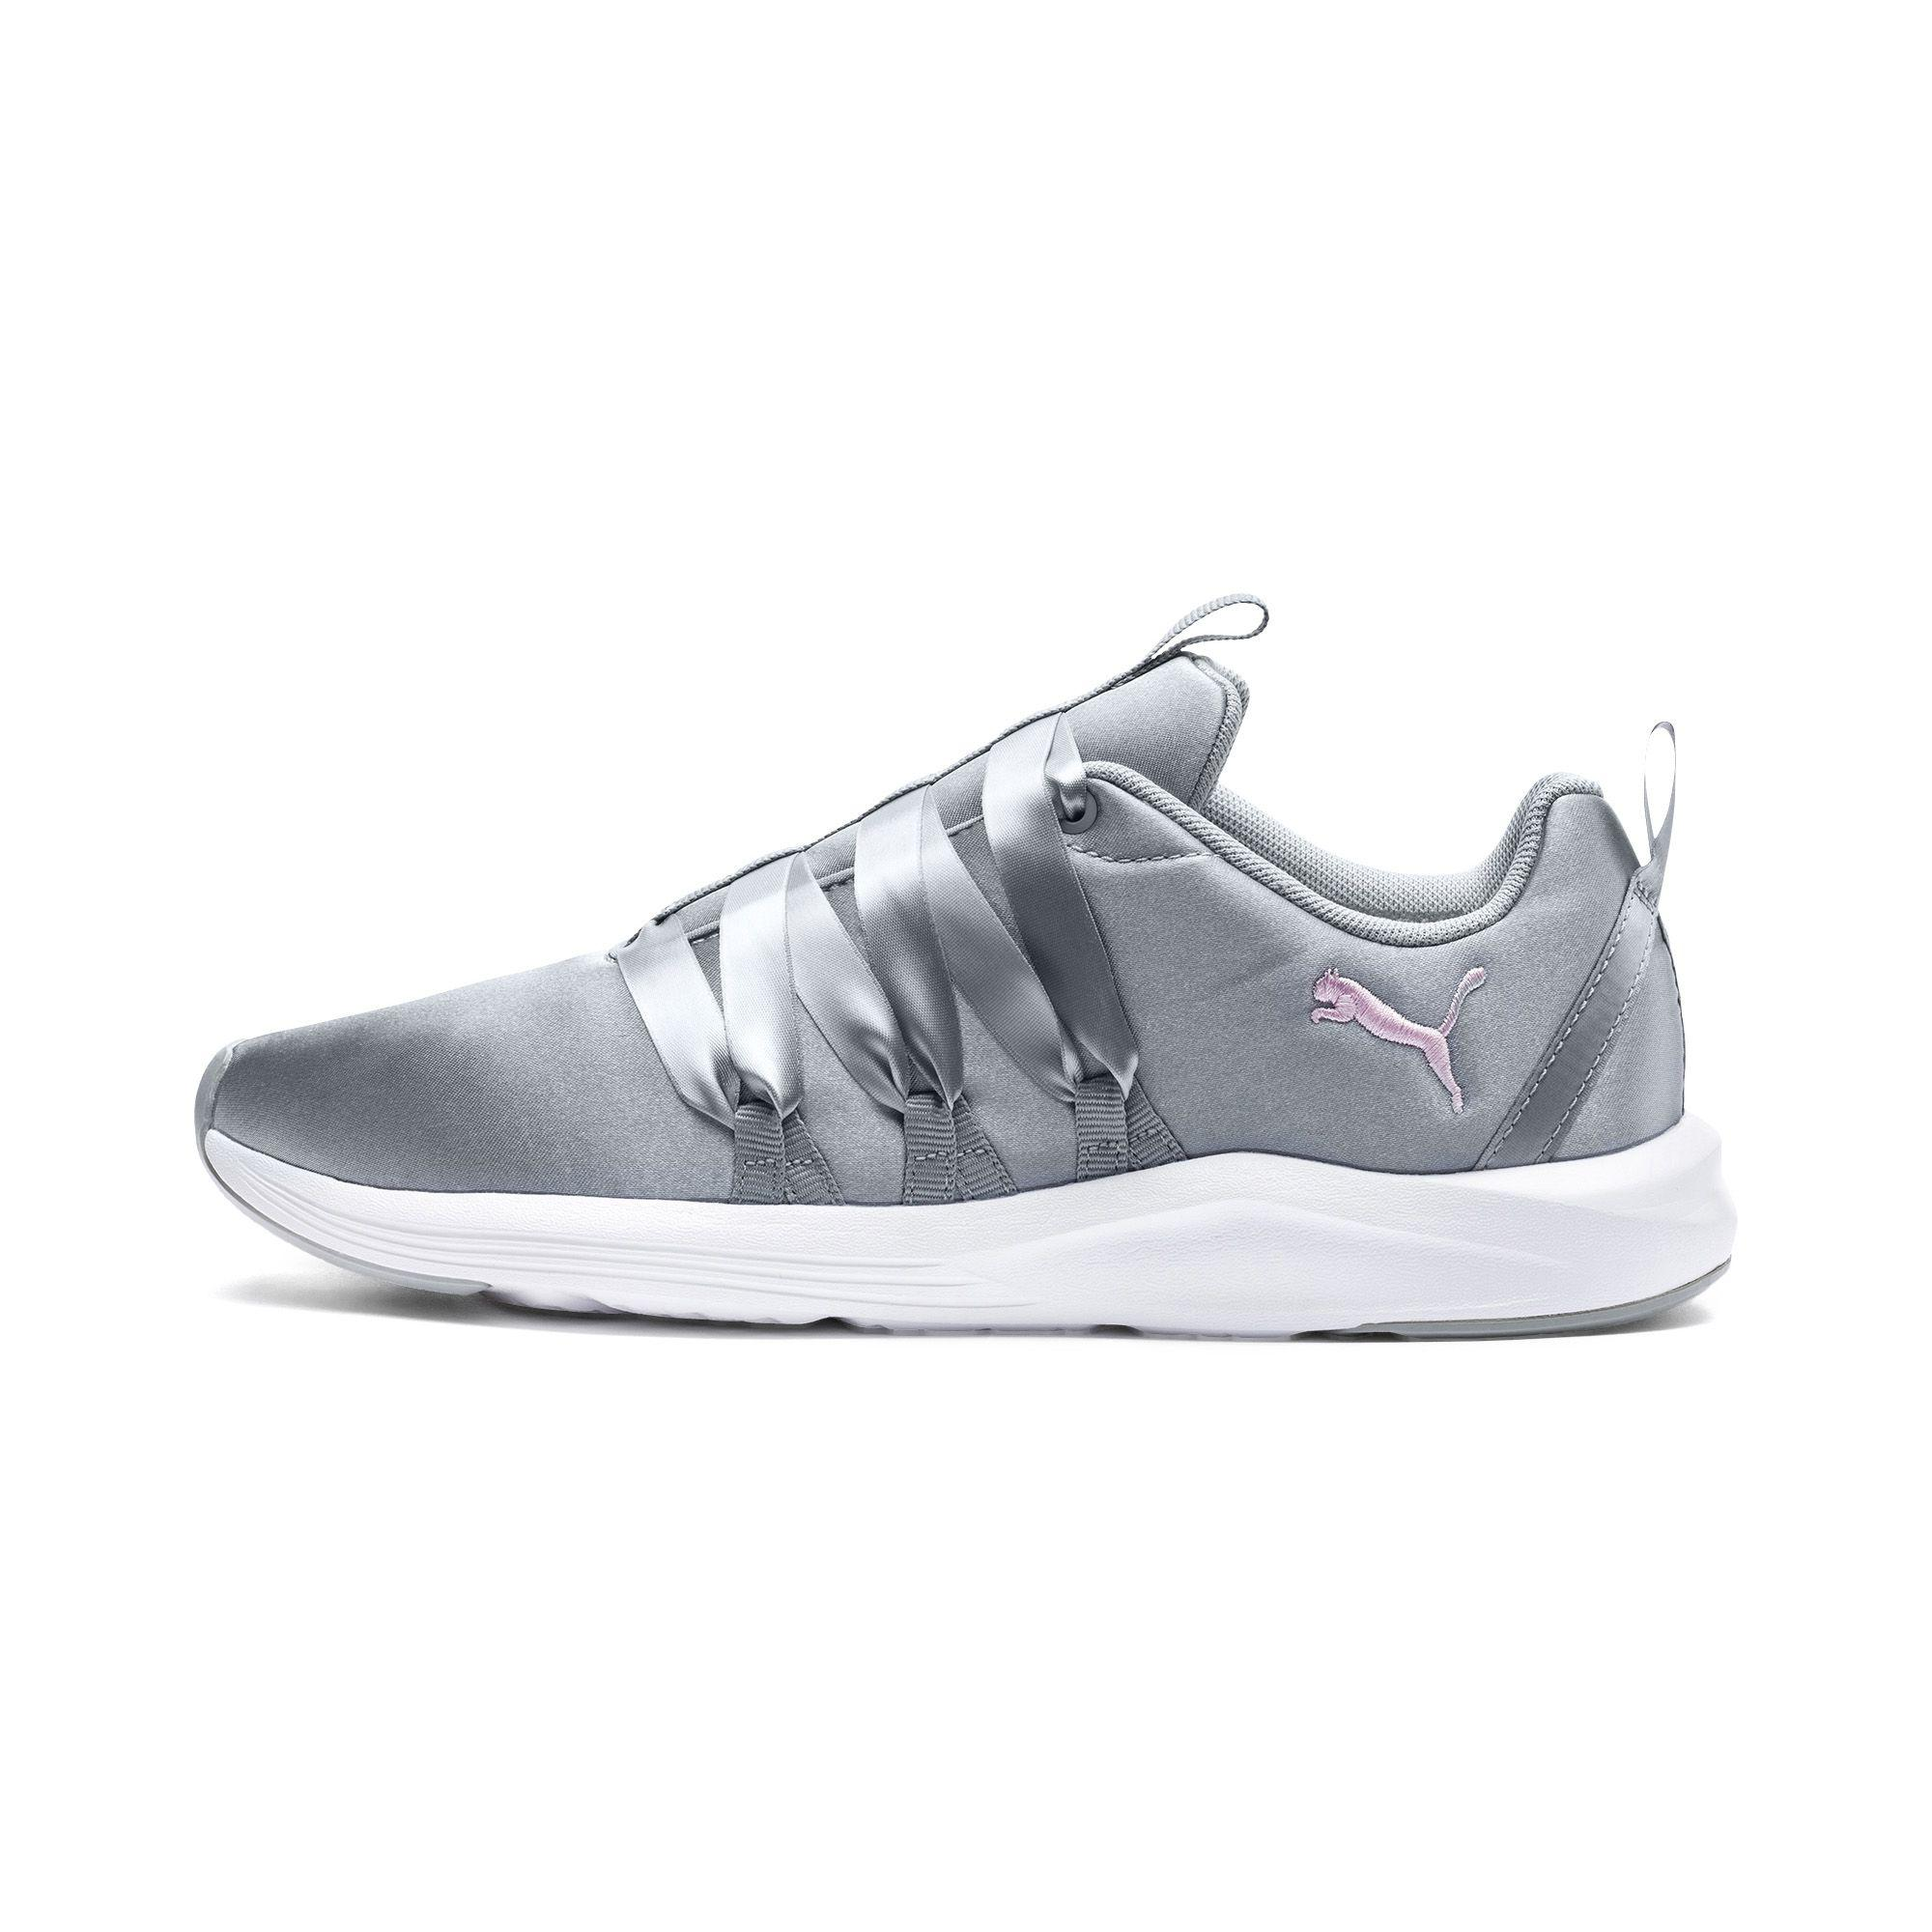 e5b767dbb1dd Lyst - PUMA Prowl Alt Satin Women s Training Shoes in White - Save 41%